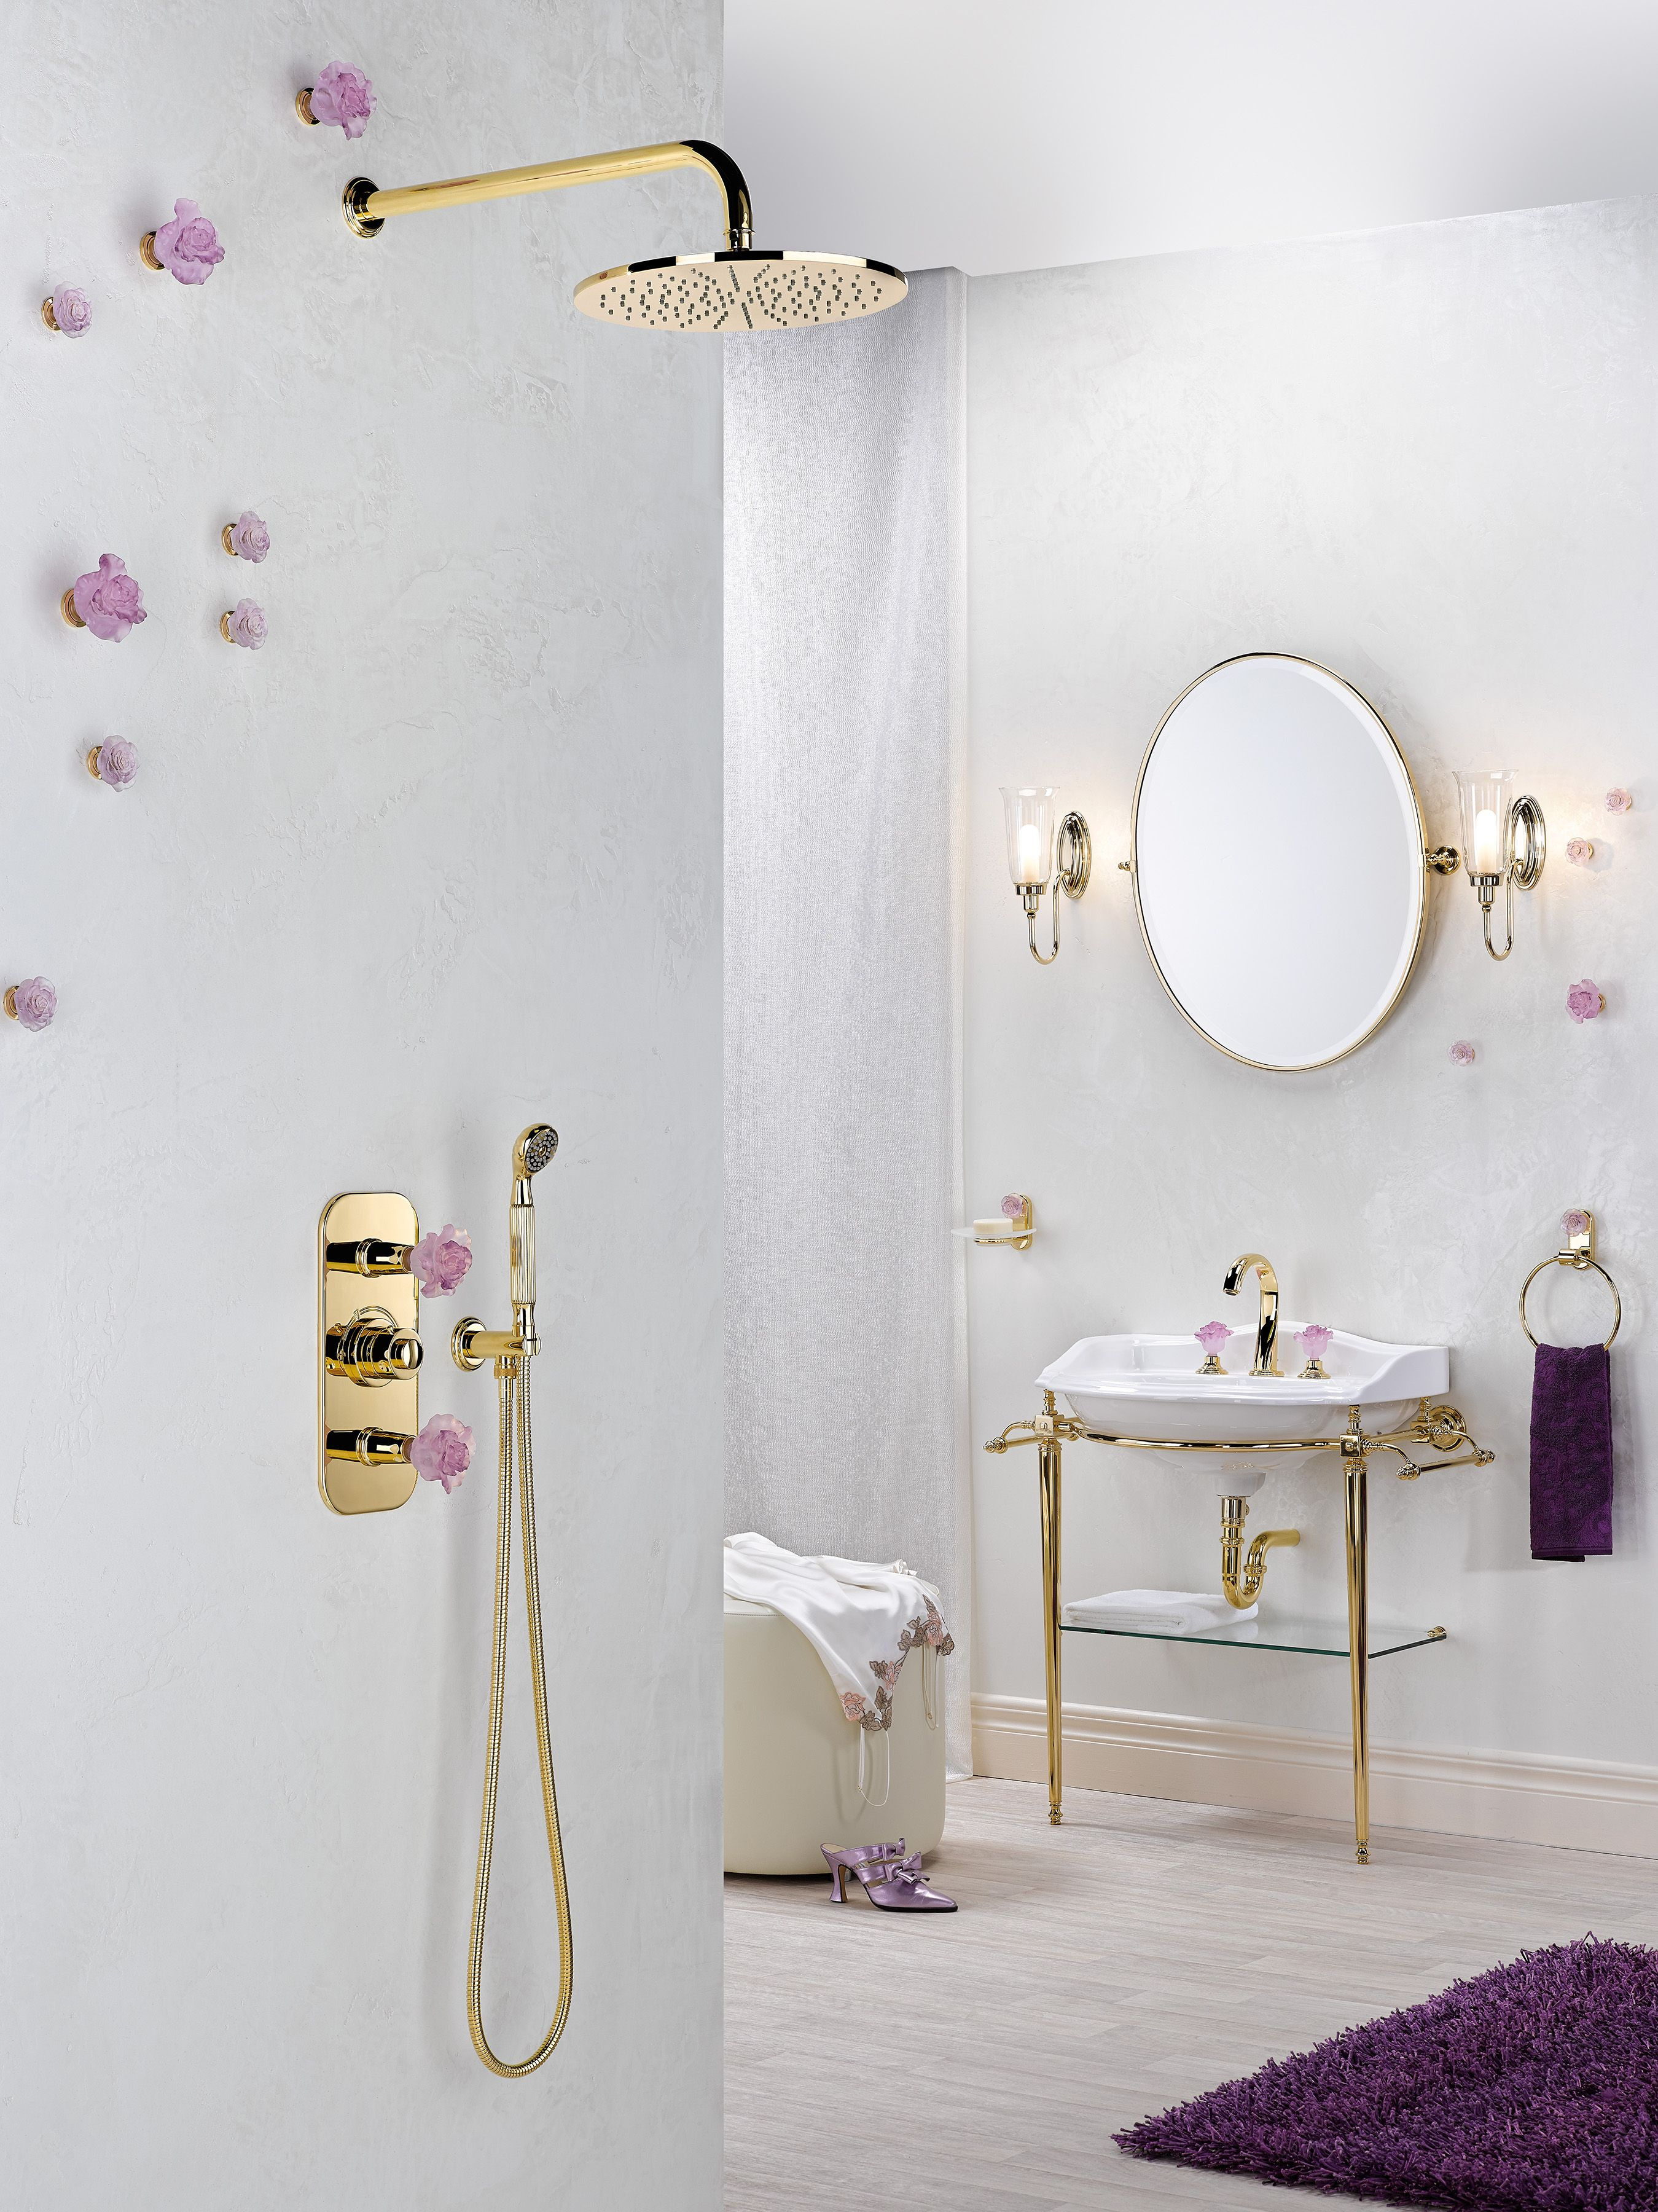 Bathroom Accessories By THG Paris Bath Decor, Shower Fixtures, Bathroom  Accessories, Interior